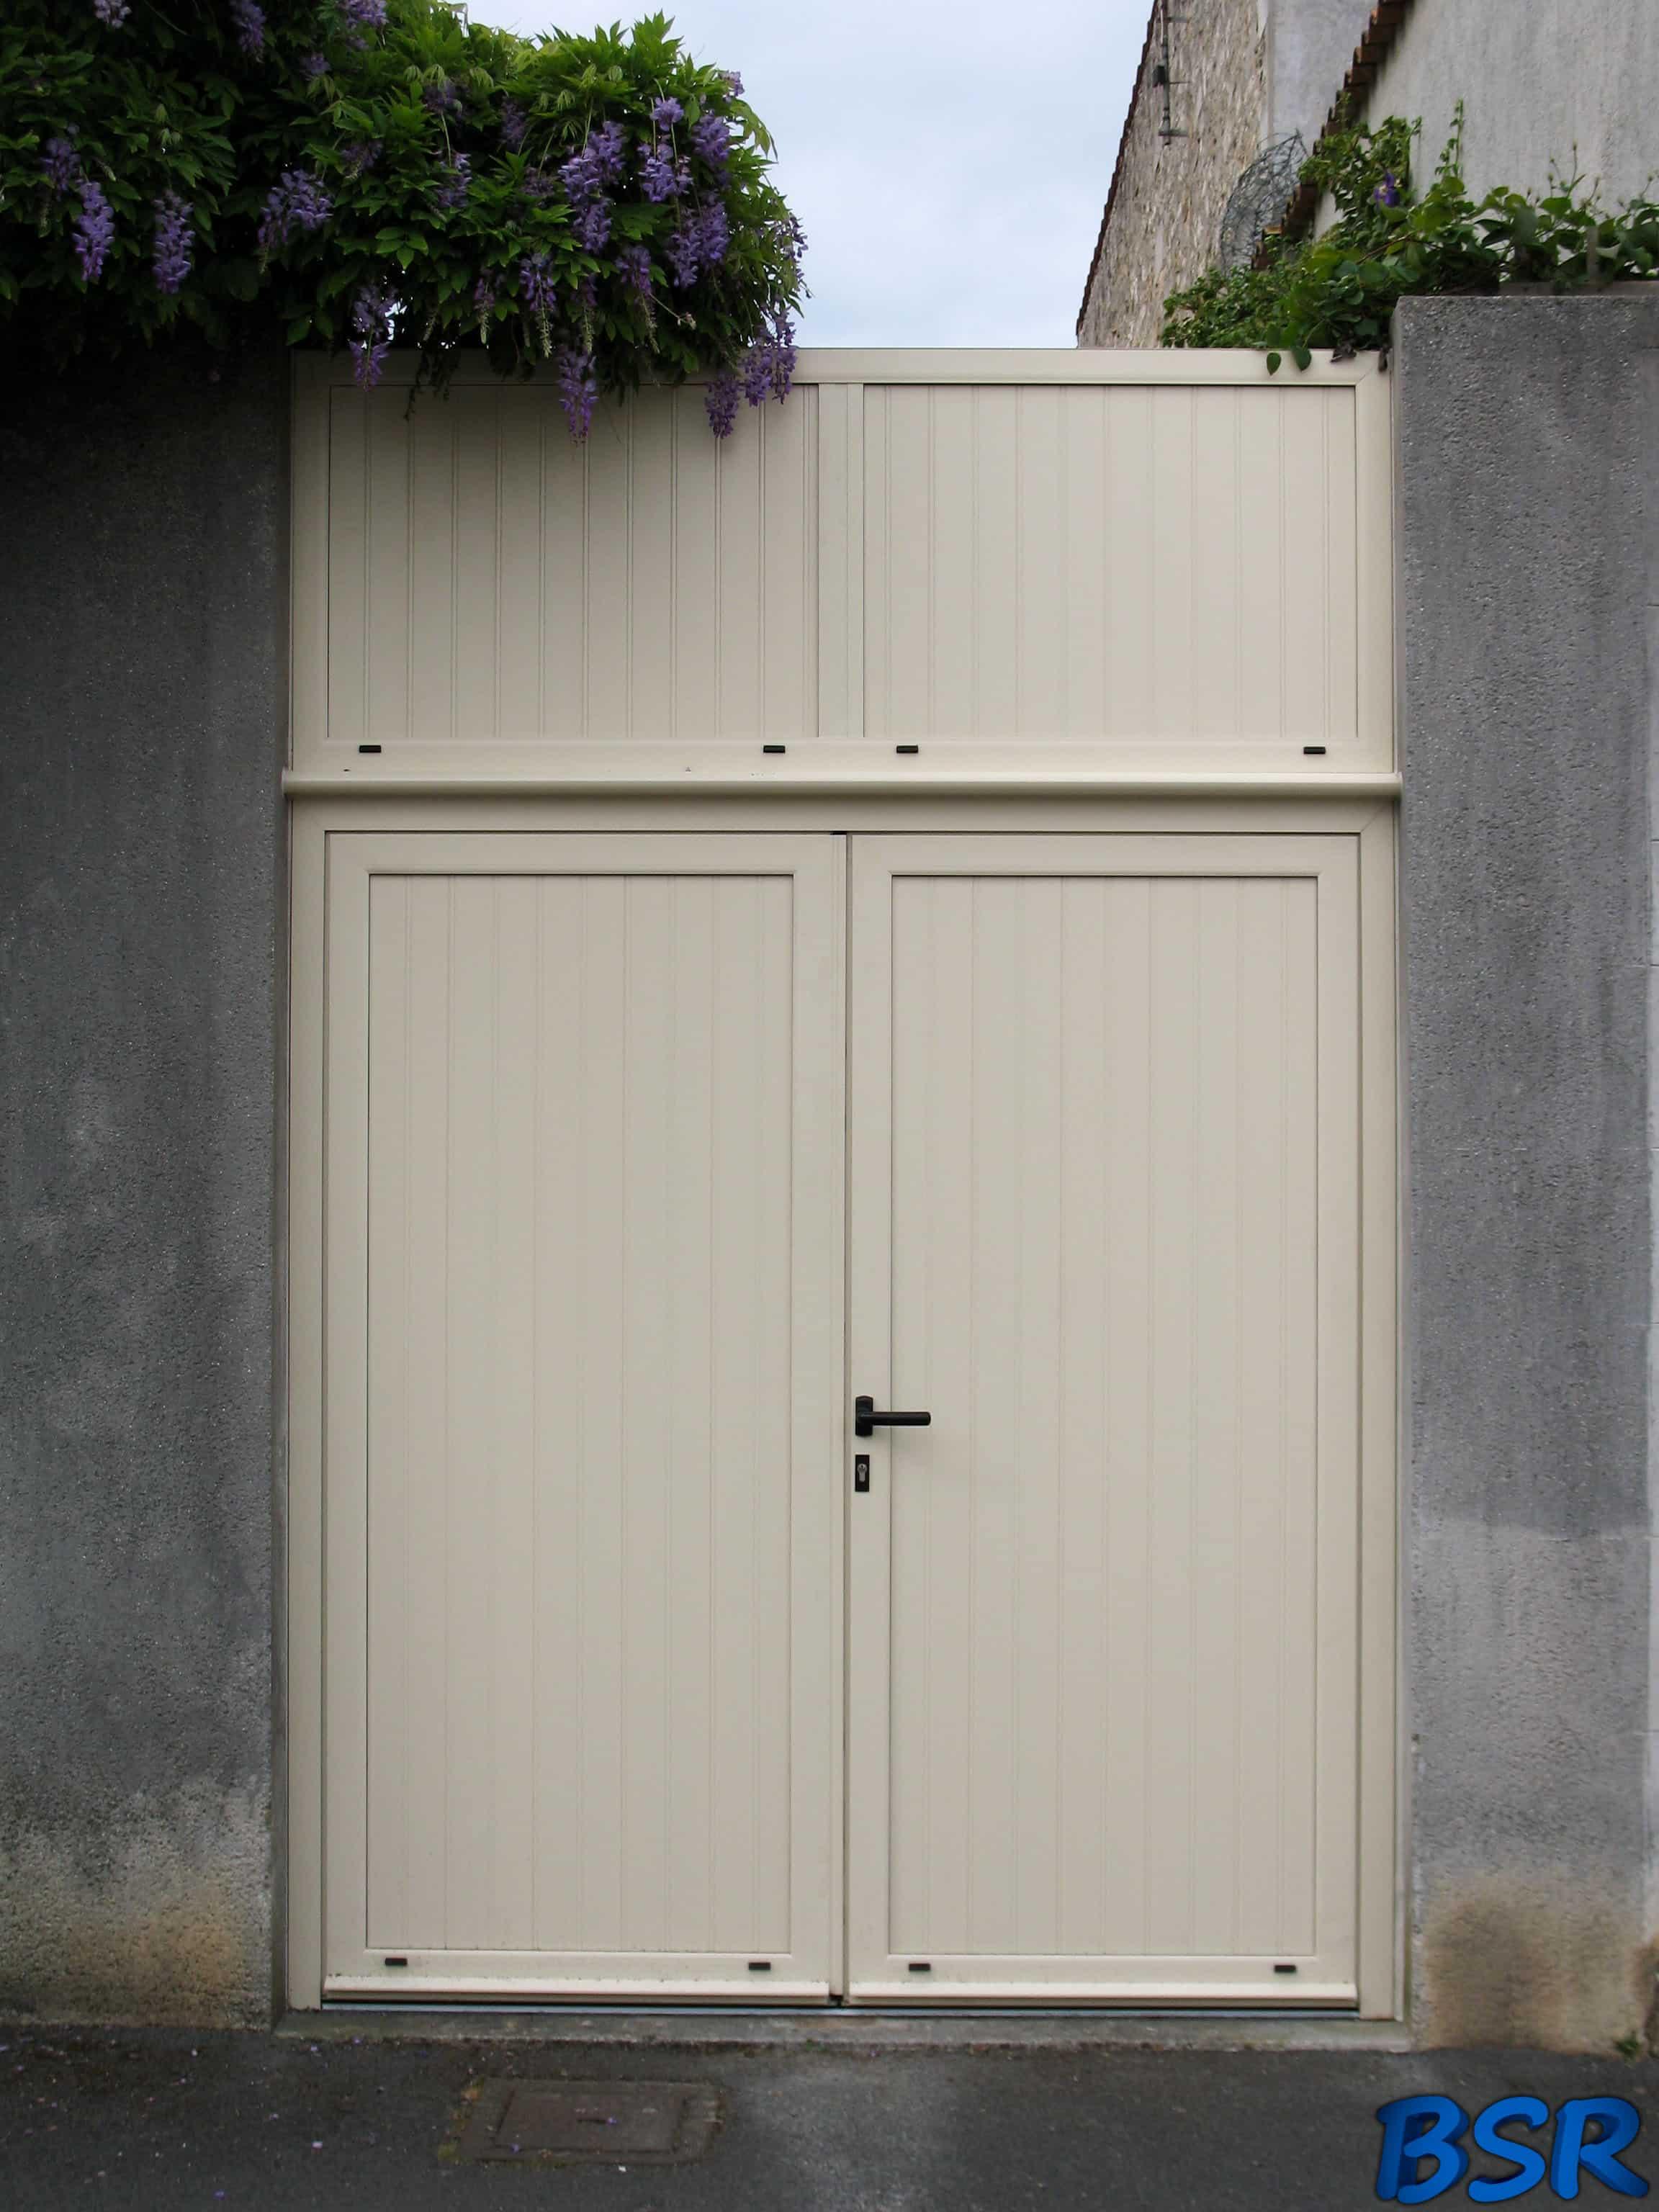 Porte et fenêtre Aluminium BSR 010